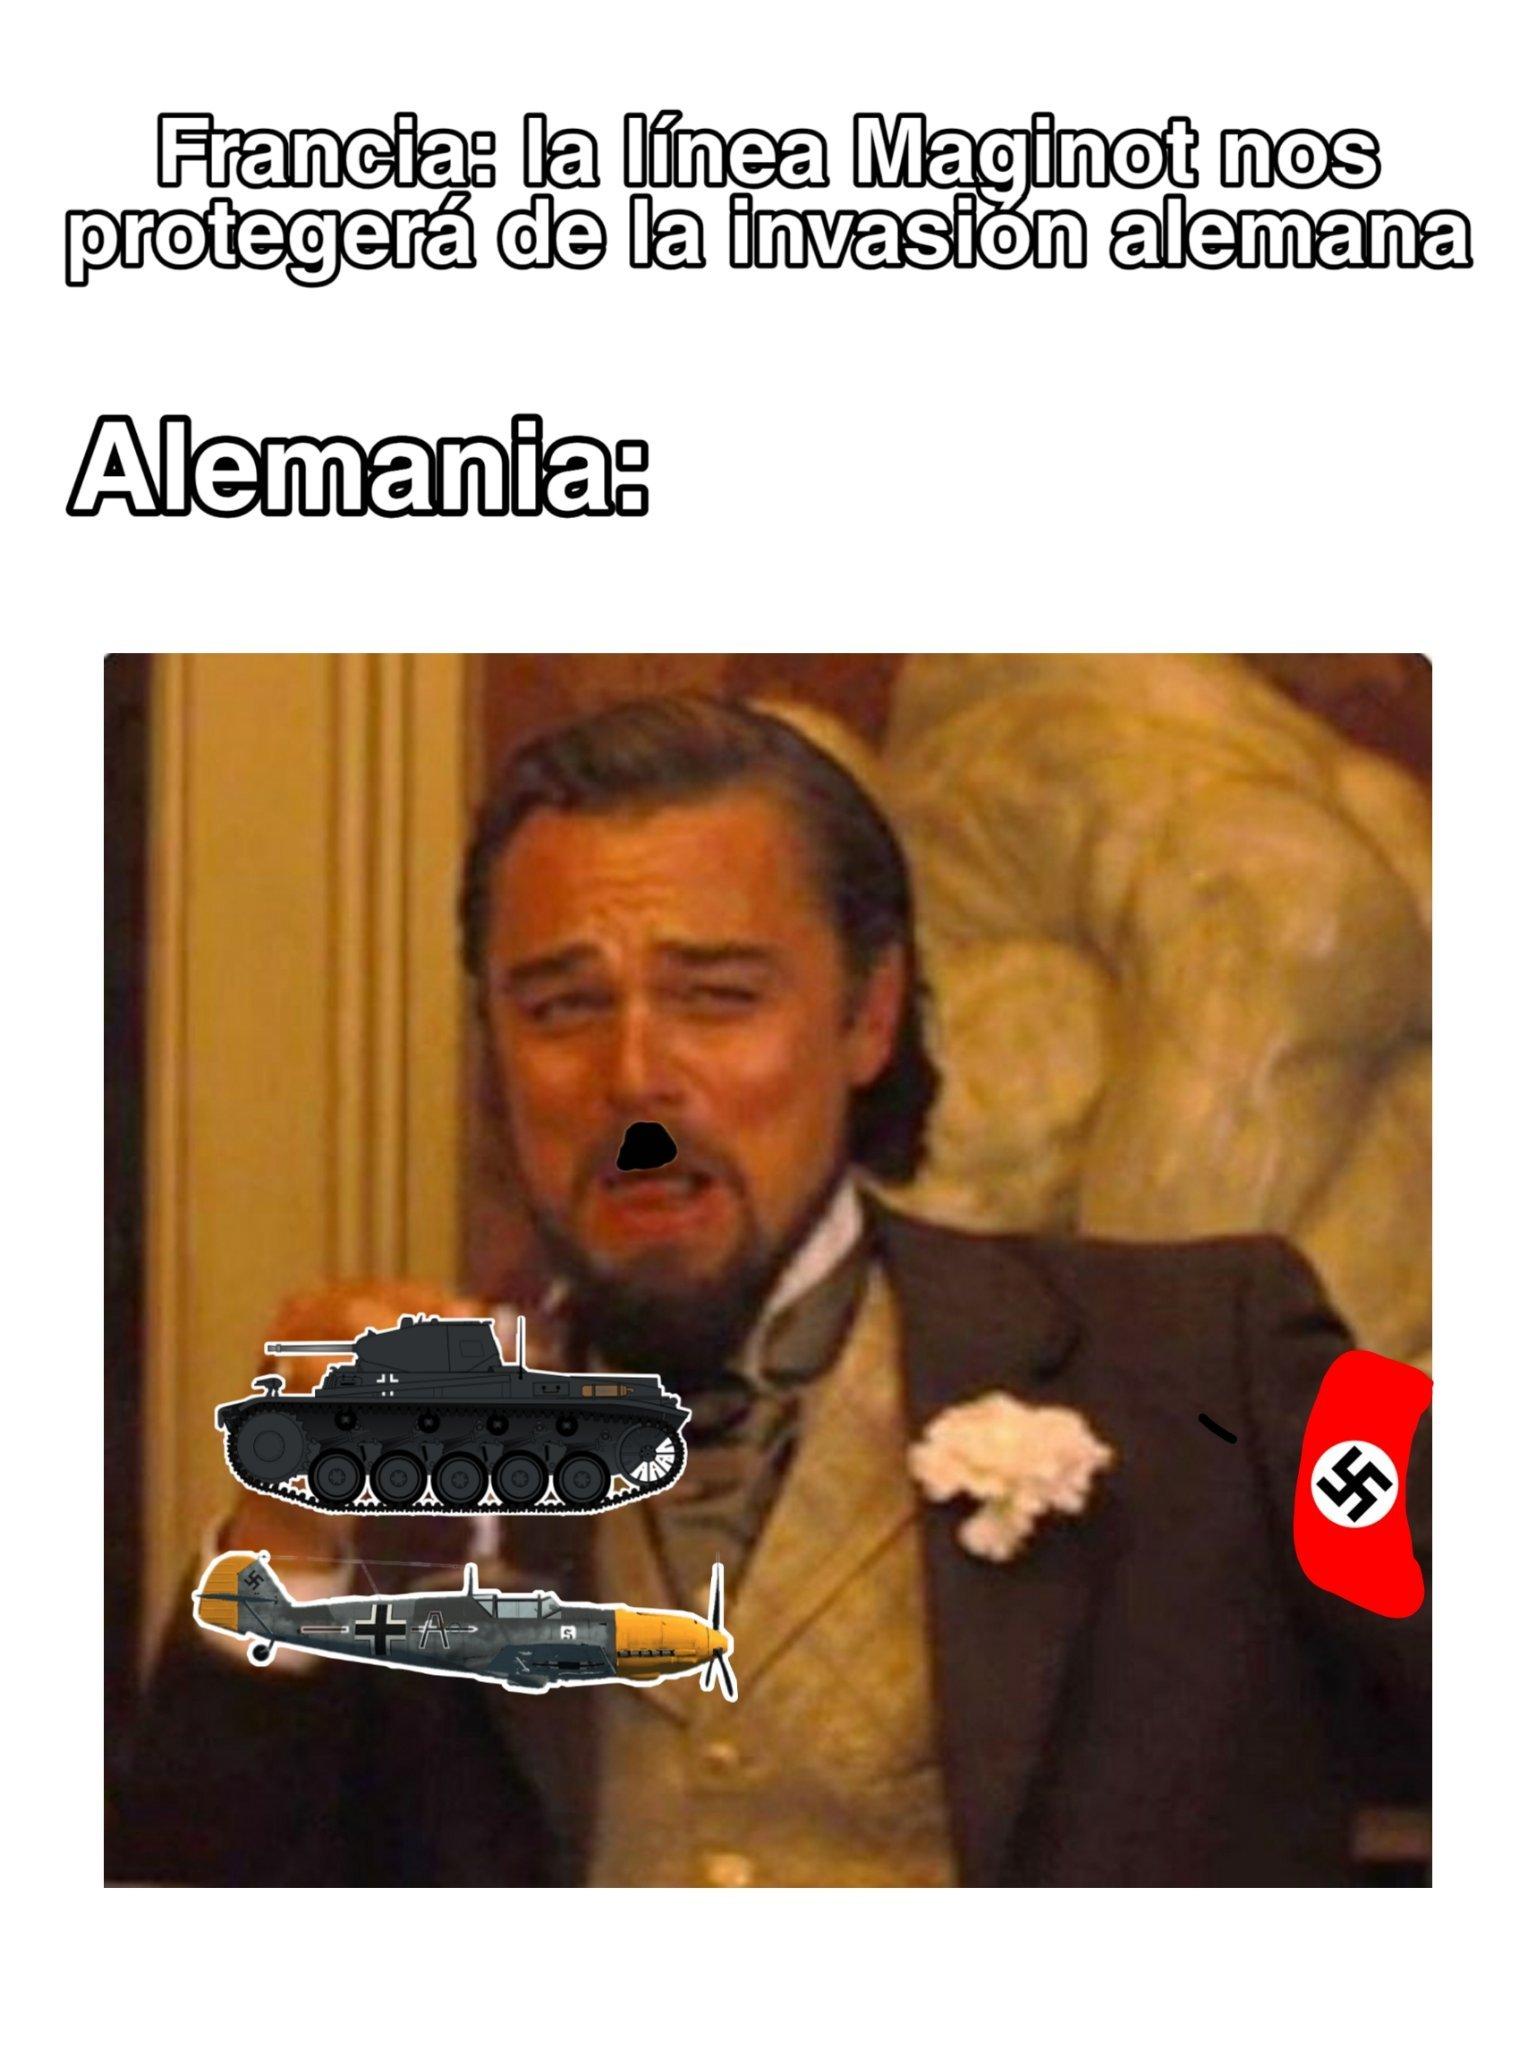 Bliztkrieg - meme